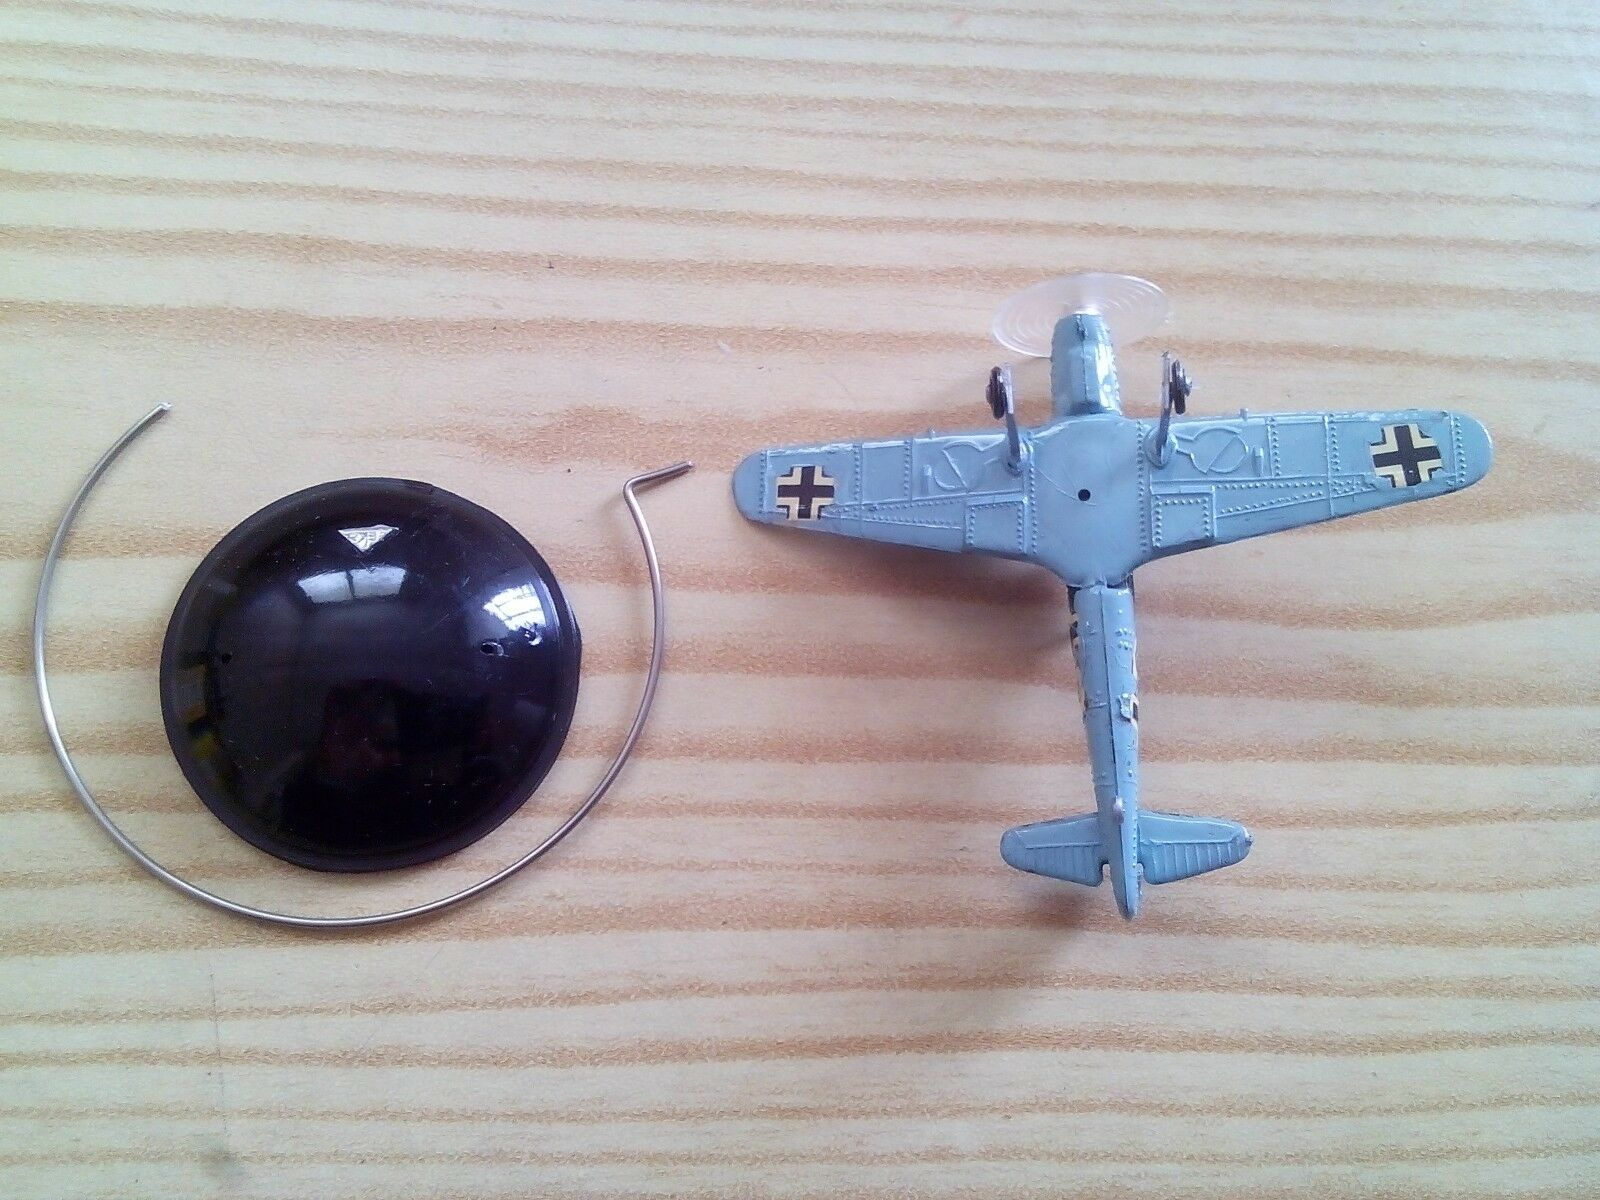 Eko Aviones - Messerschmitt ME. 109 Sin Caja - - - Lote 7 1c45ec